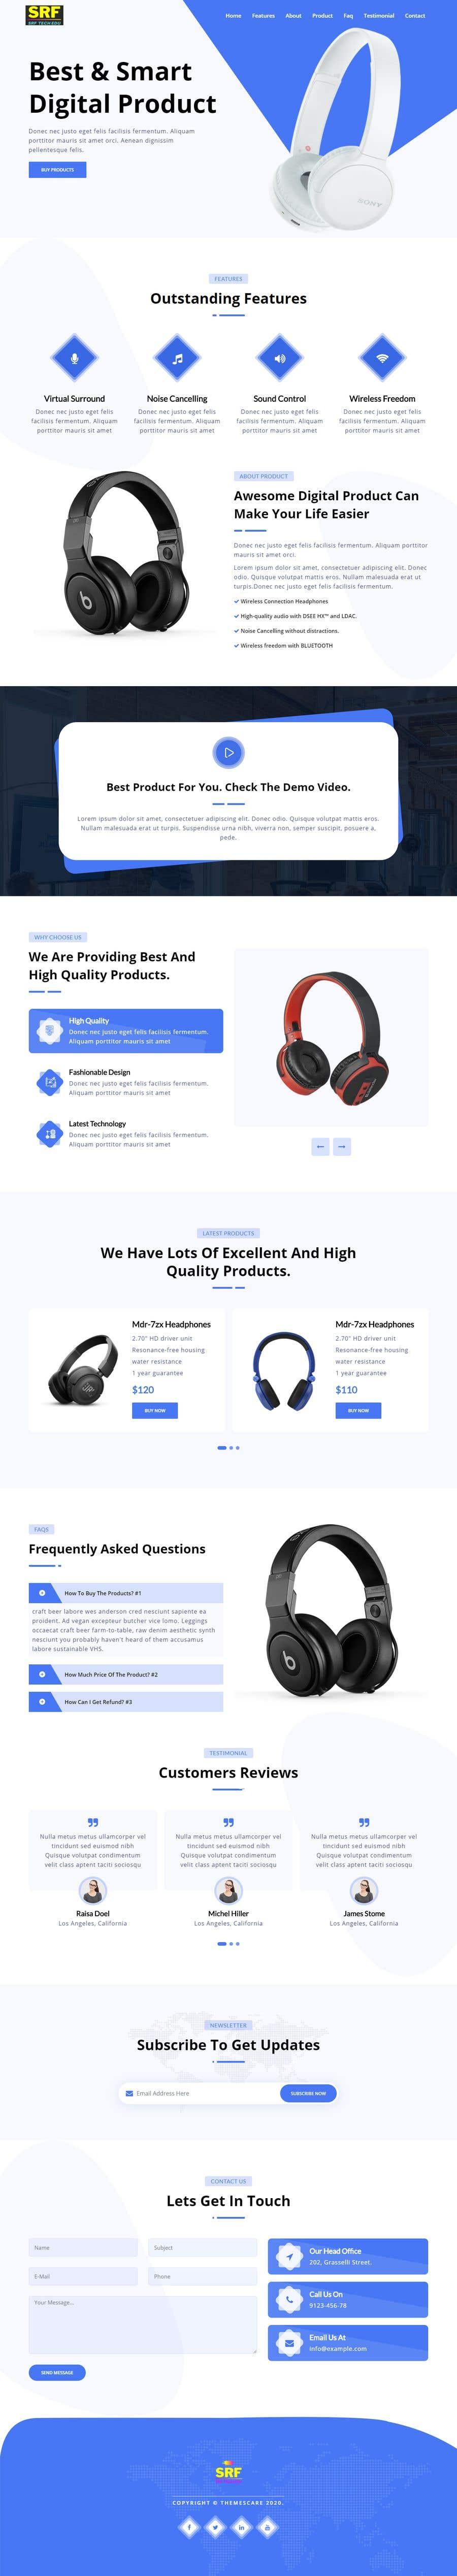 Konkurrenceindlæg #                                        46                                      for                                         Looking for best Website Landing Page Designer for My Product Landing Page